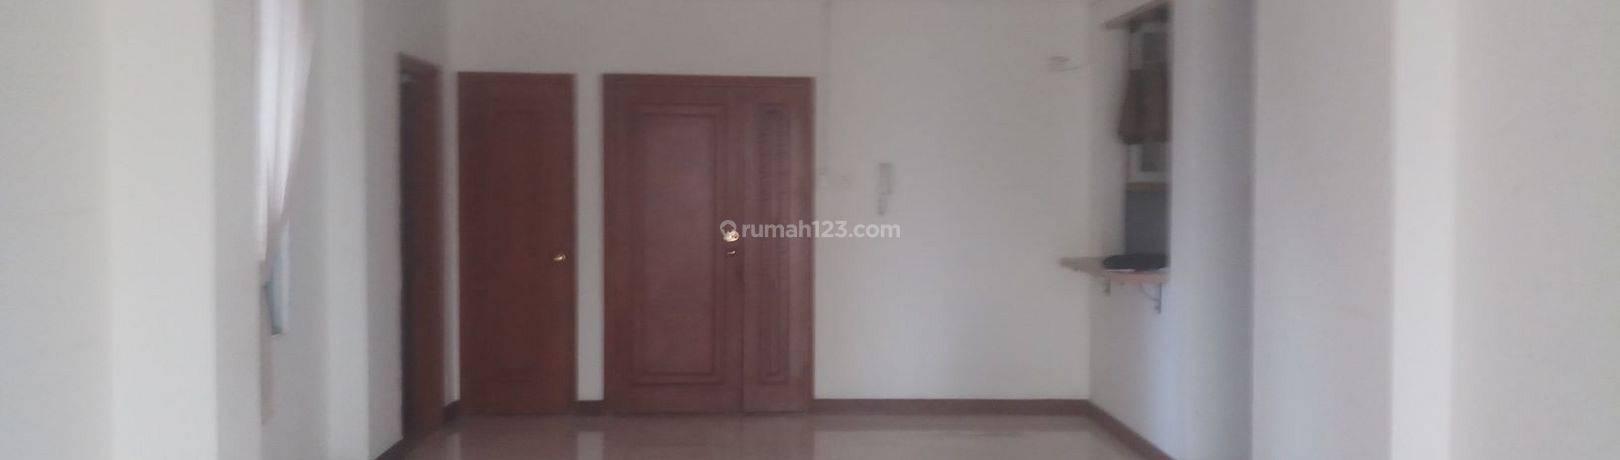 Apartemen Kintamani 3 Kamar Tidur 149 M2 Nuansa Bali @ Kebayoran Baru Dekat SCBD